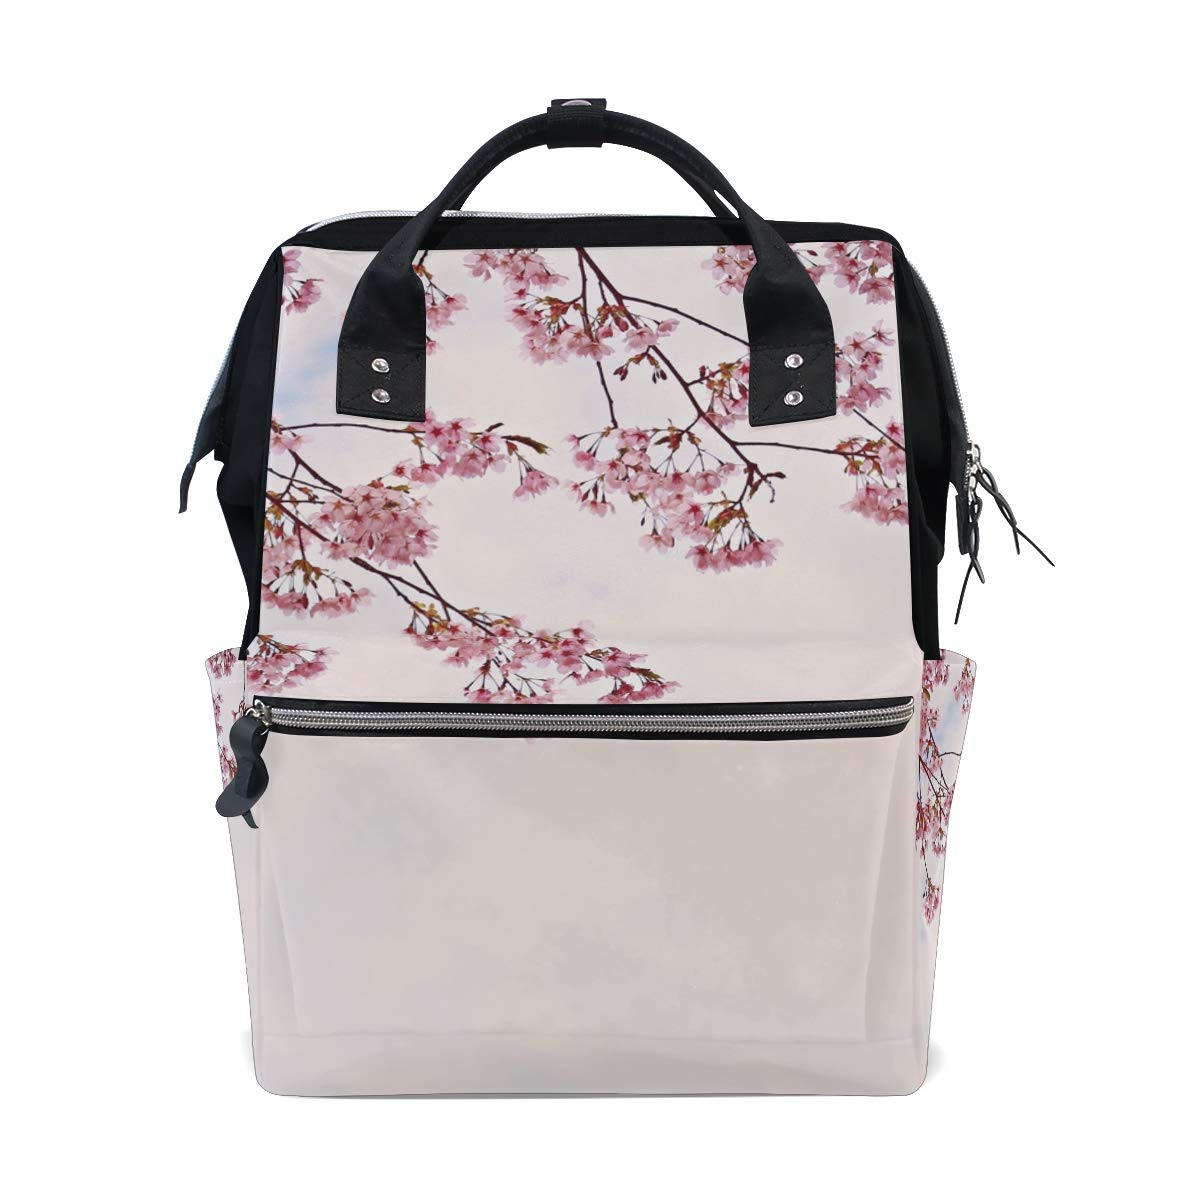 KRYSTYMG Diaper Bag Pink Plum Blossom Backpack Multifunction Travel Back Pack Waterproof Maternity Baby Nursing Nappy Bag for Boy/Girl on Travel Large & Stylish & Durable